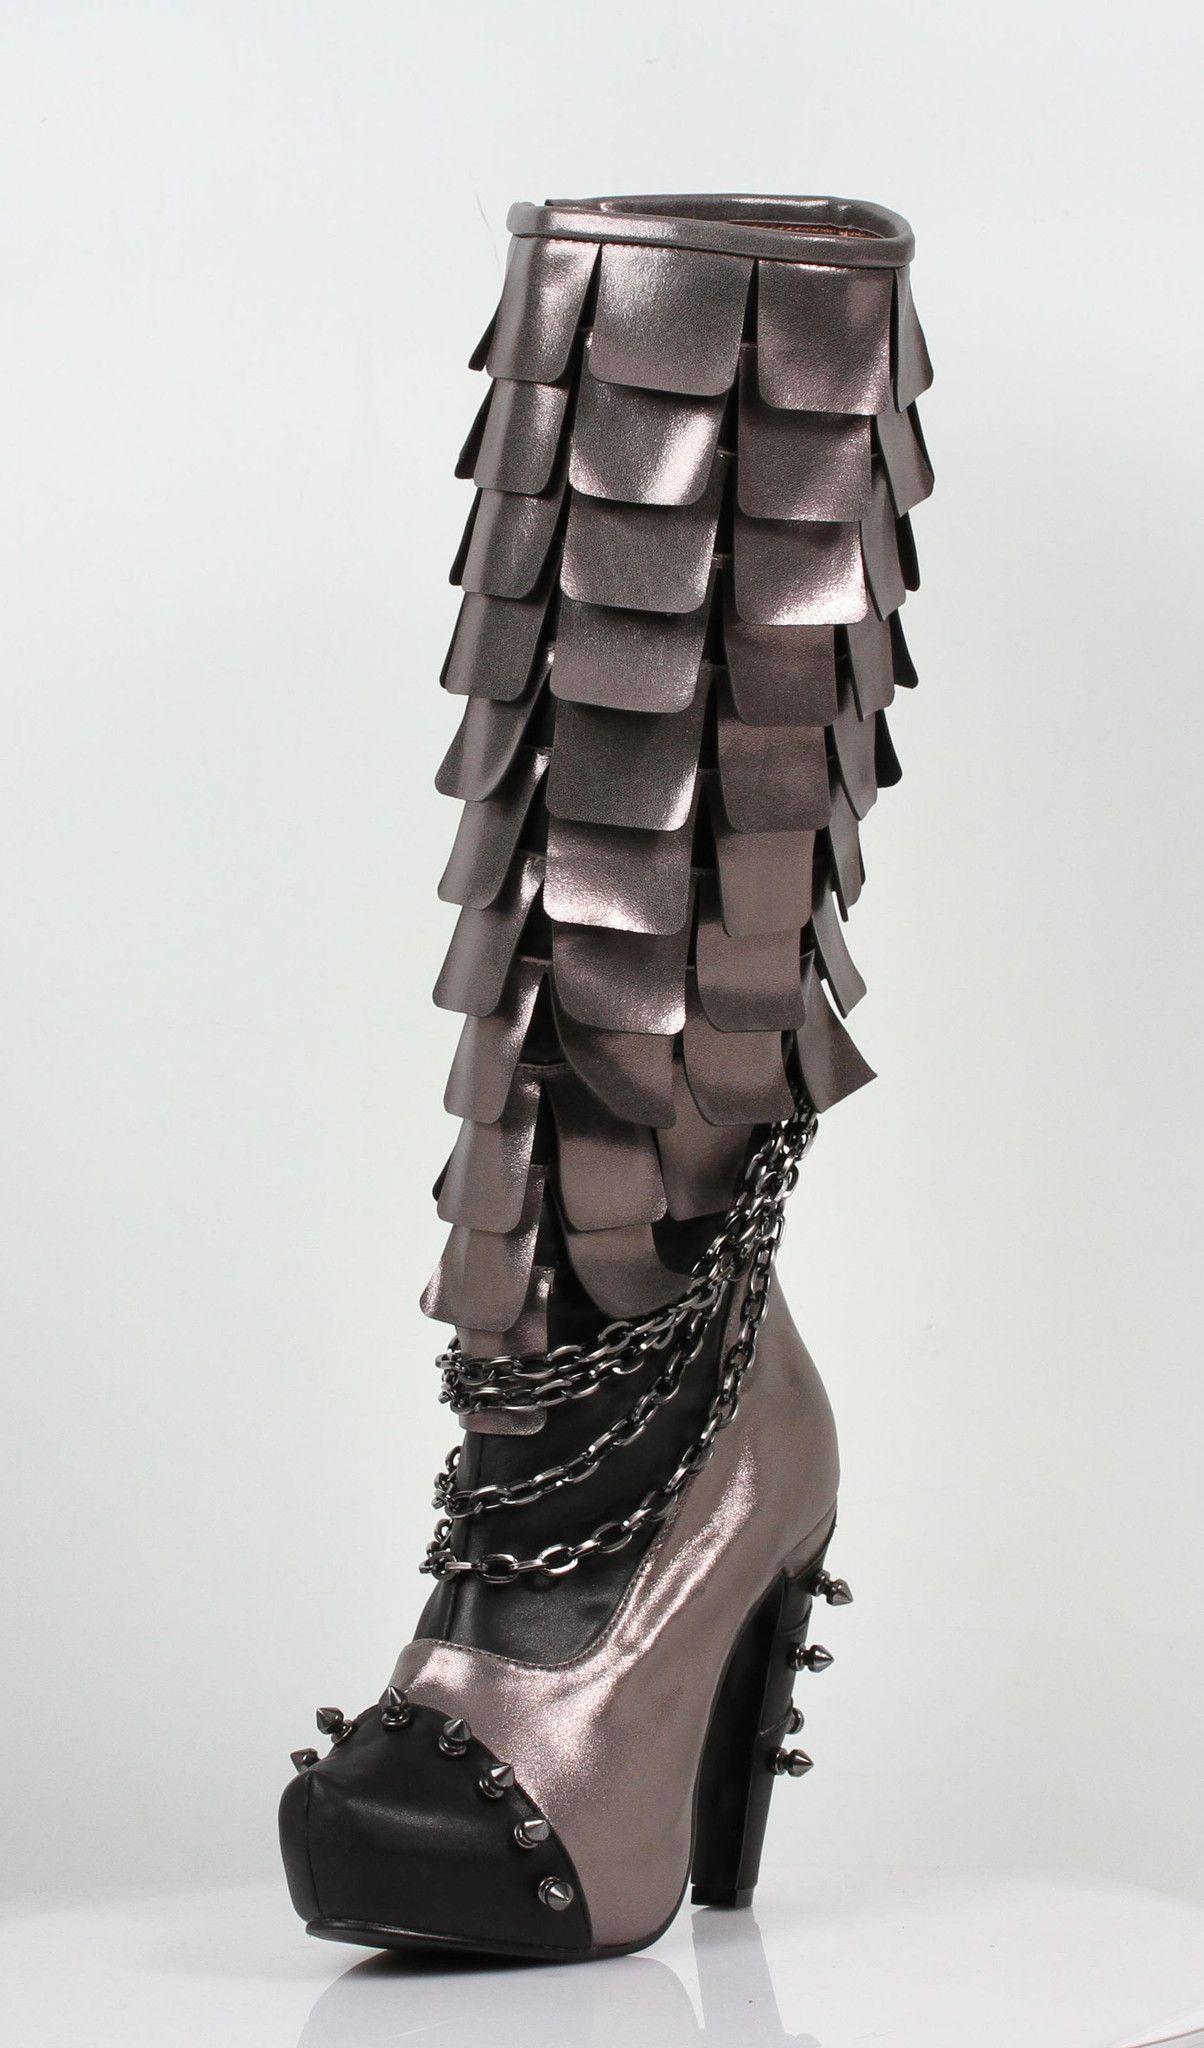 HADES Leia Platform Shoes